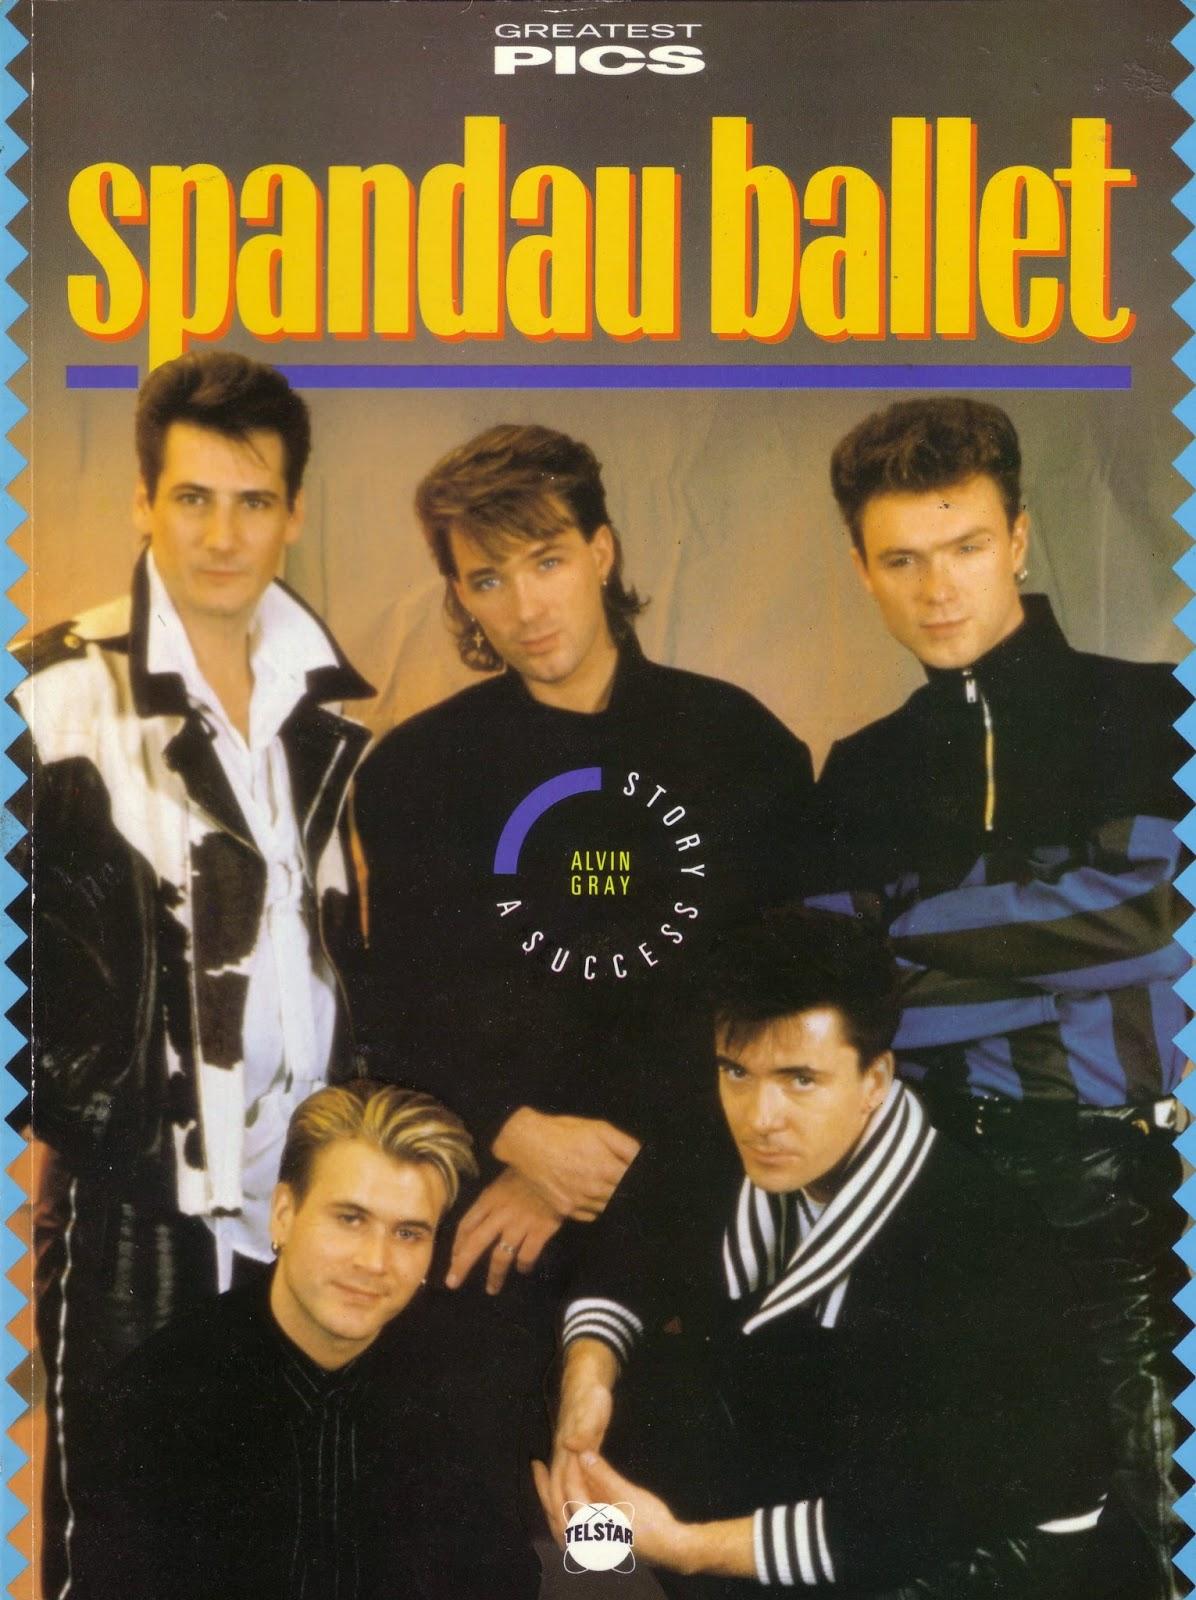 True Cover Version of Spandau Ballet  JN Creative